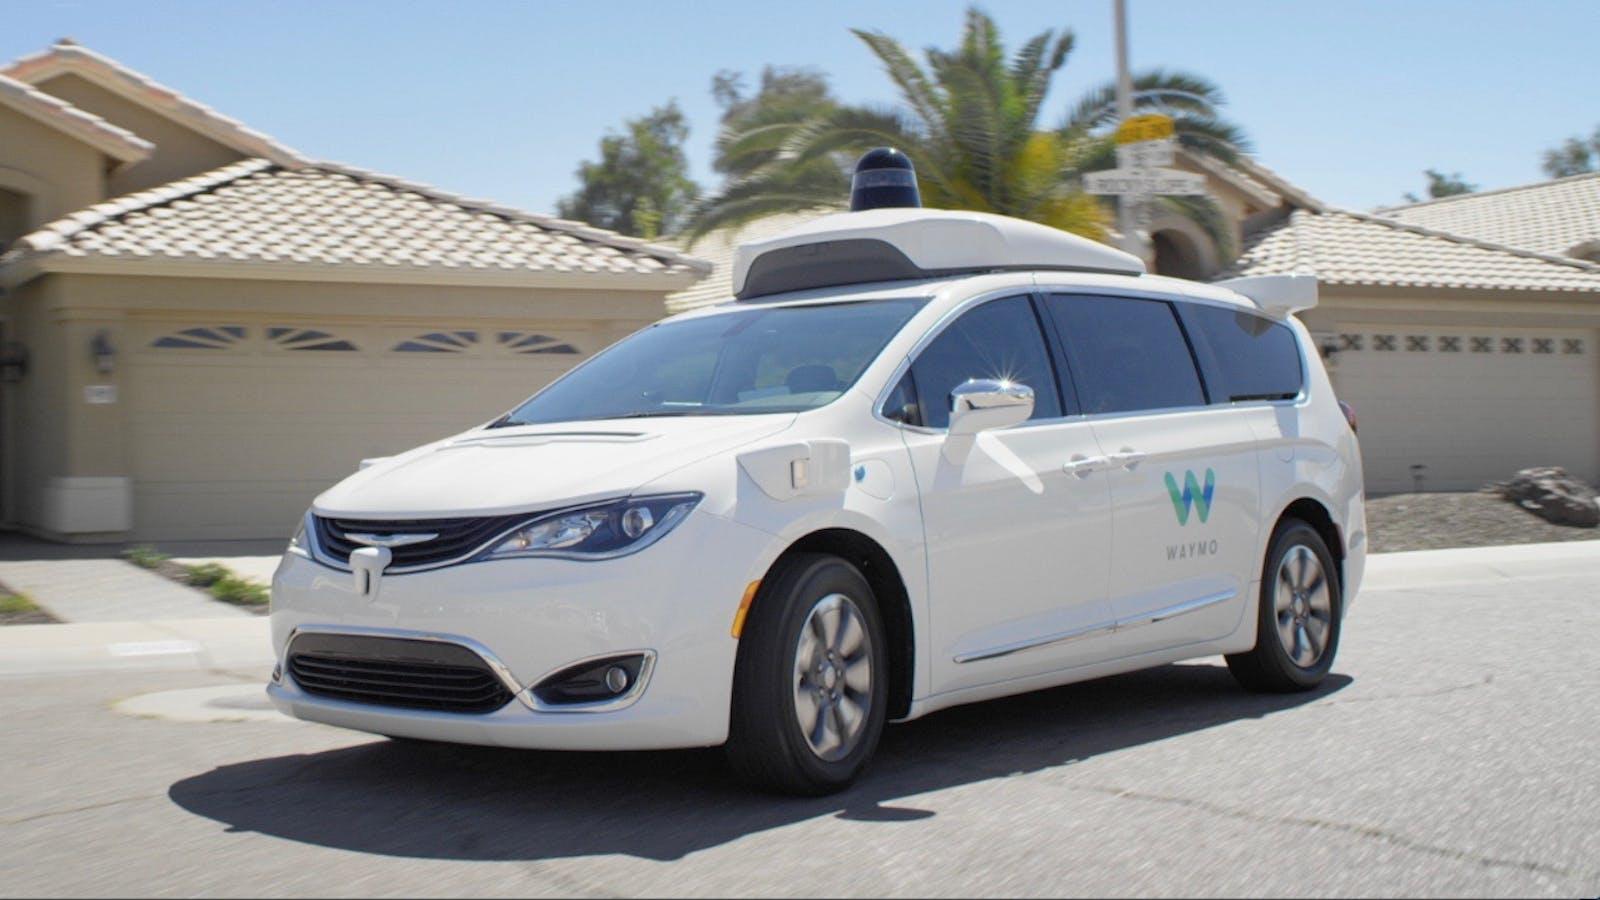 A Waymo minivan in Phoenix. Source: Waymo.